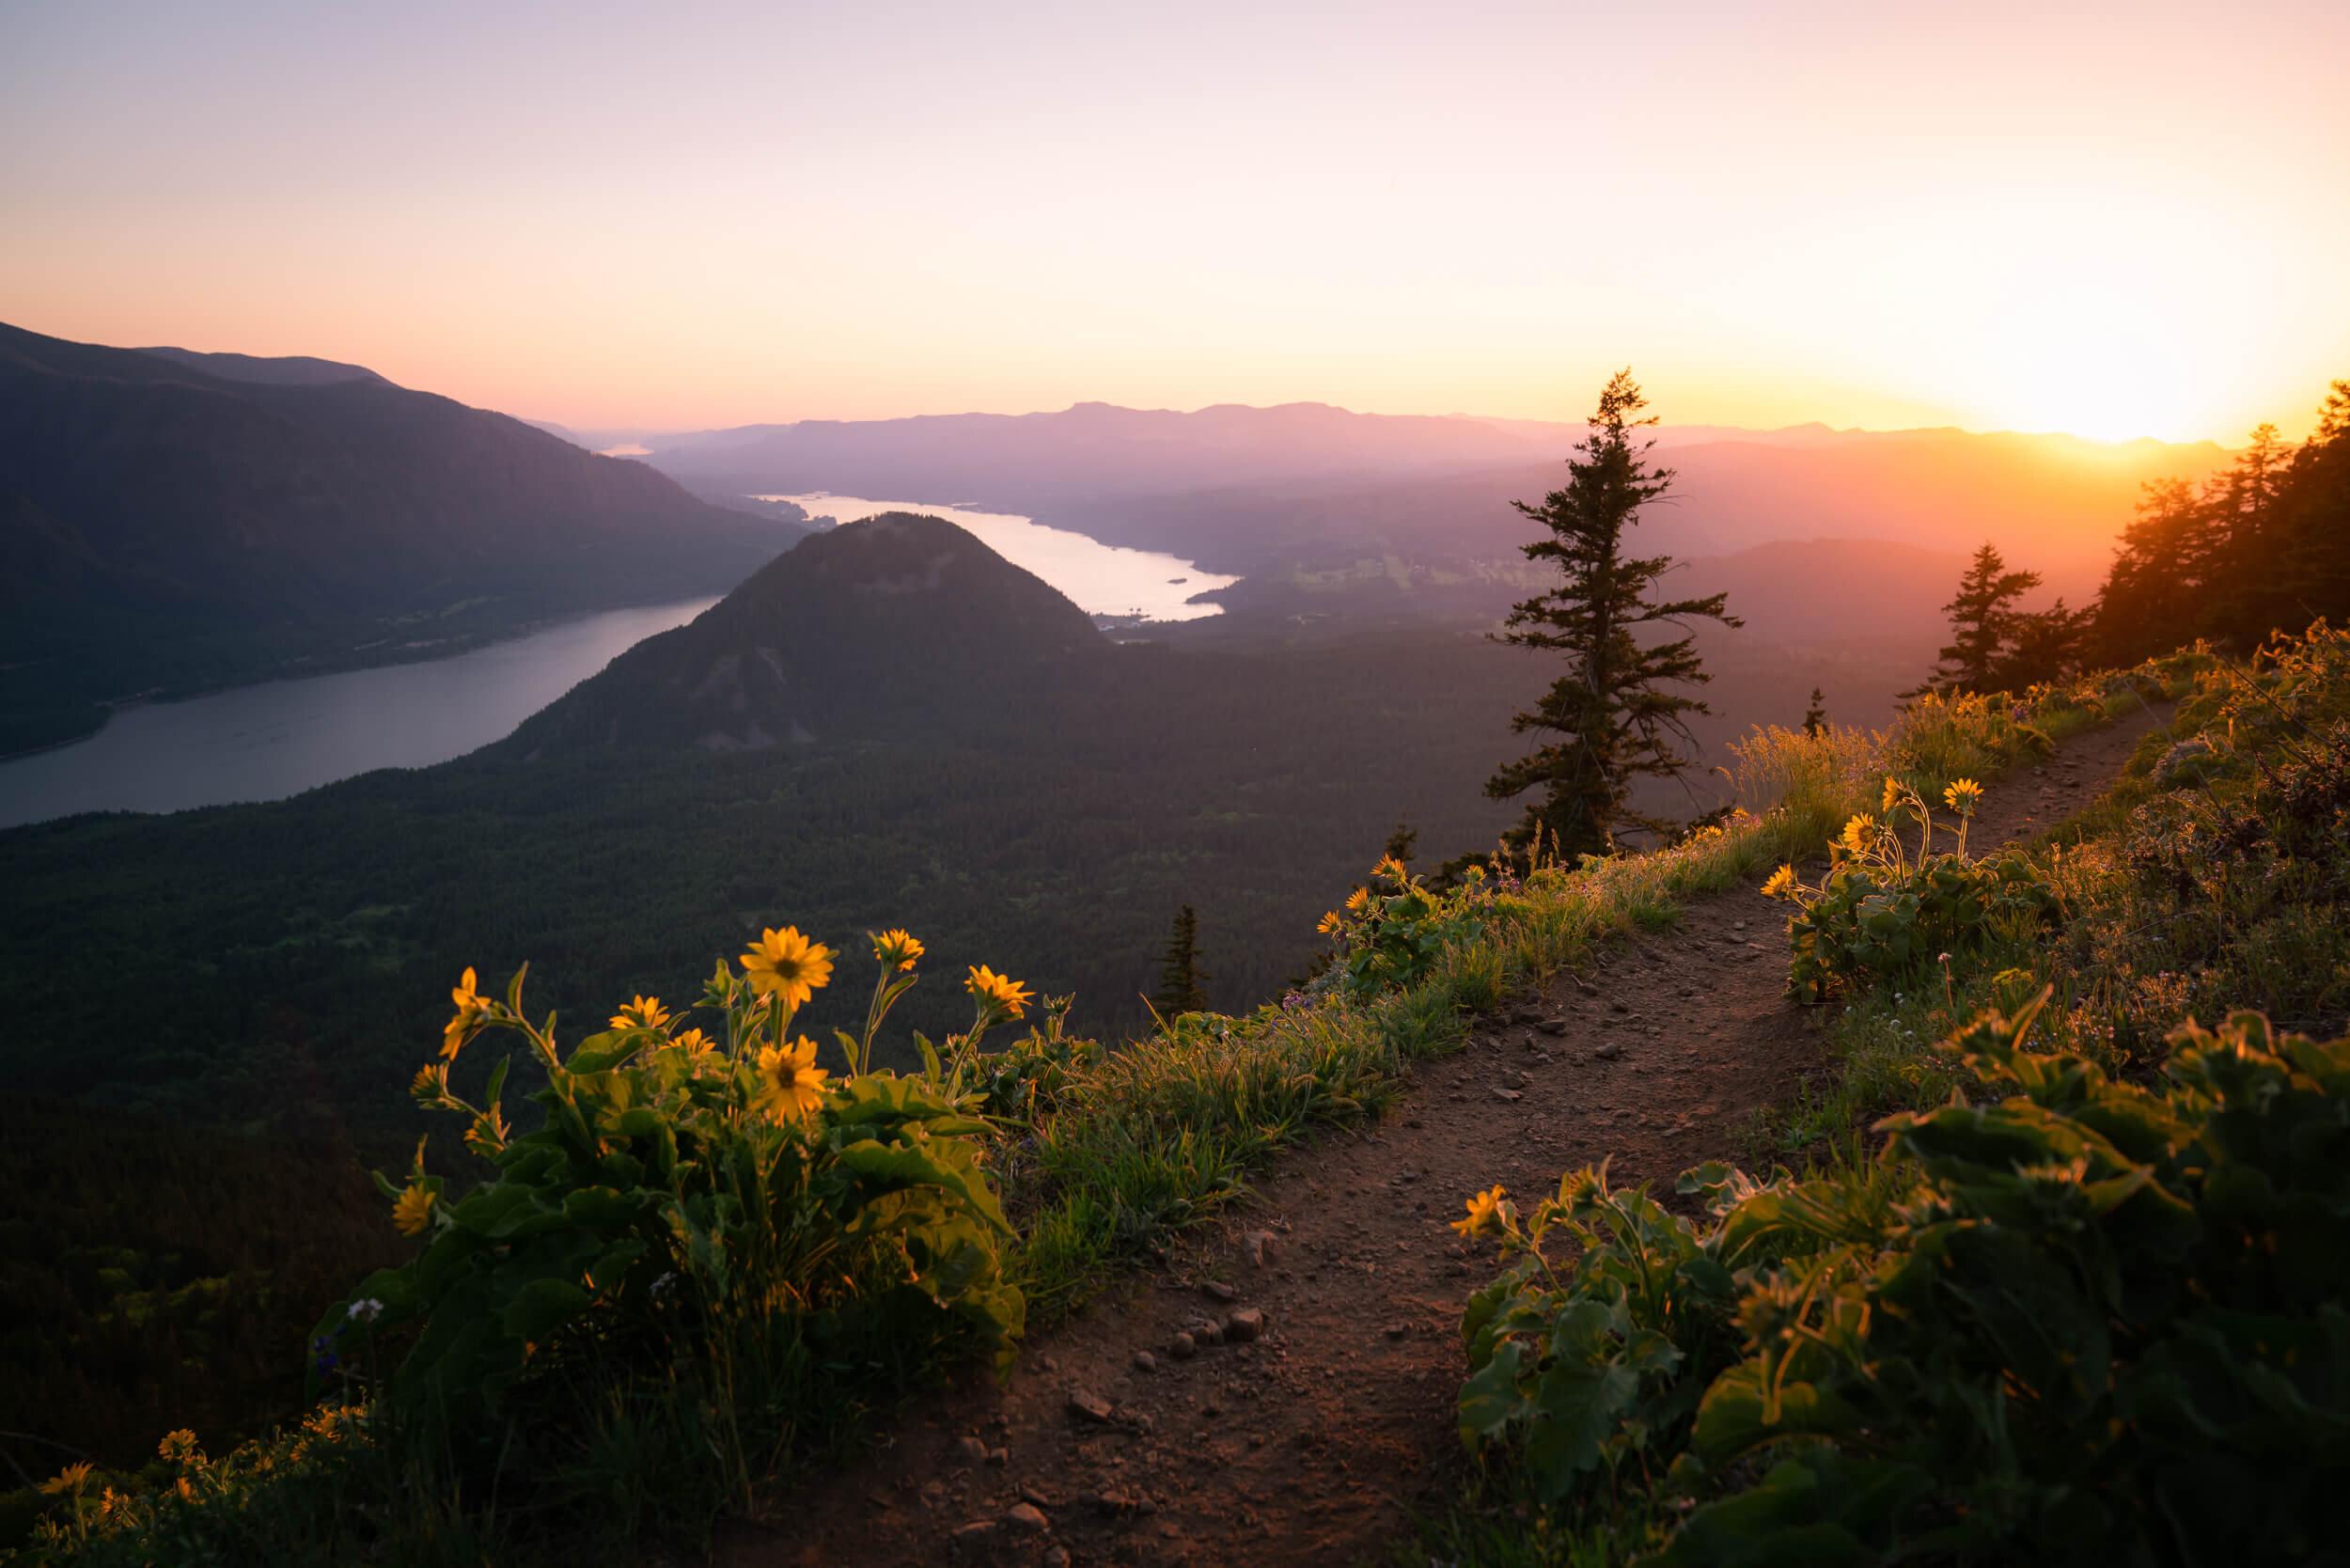 Sunset up at Dog Mountain.